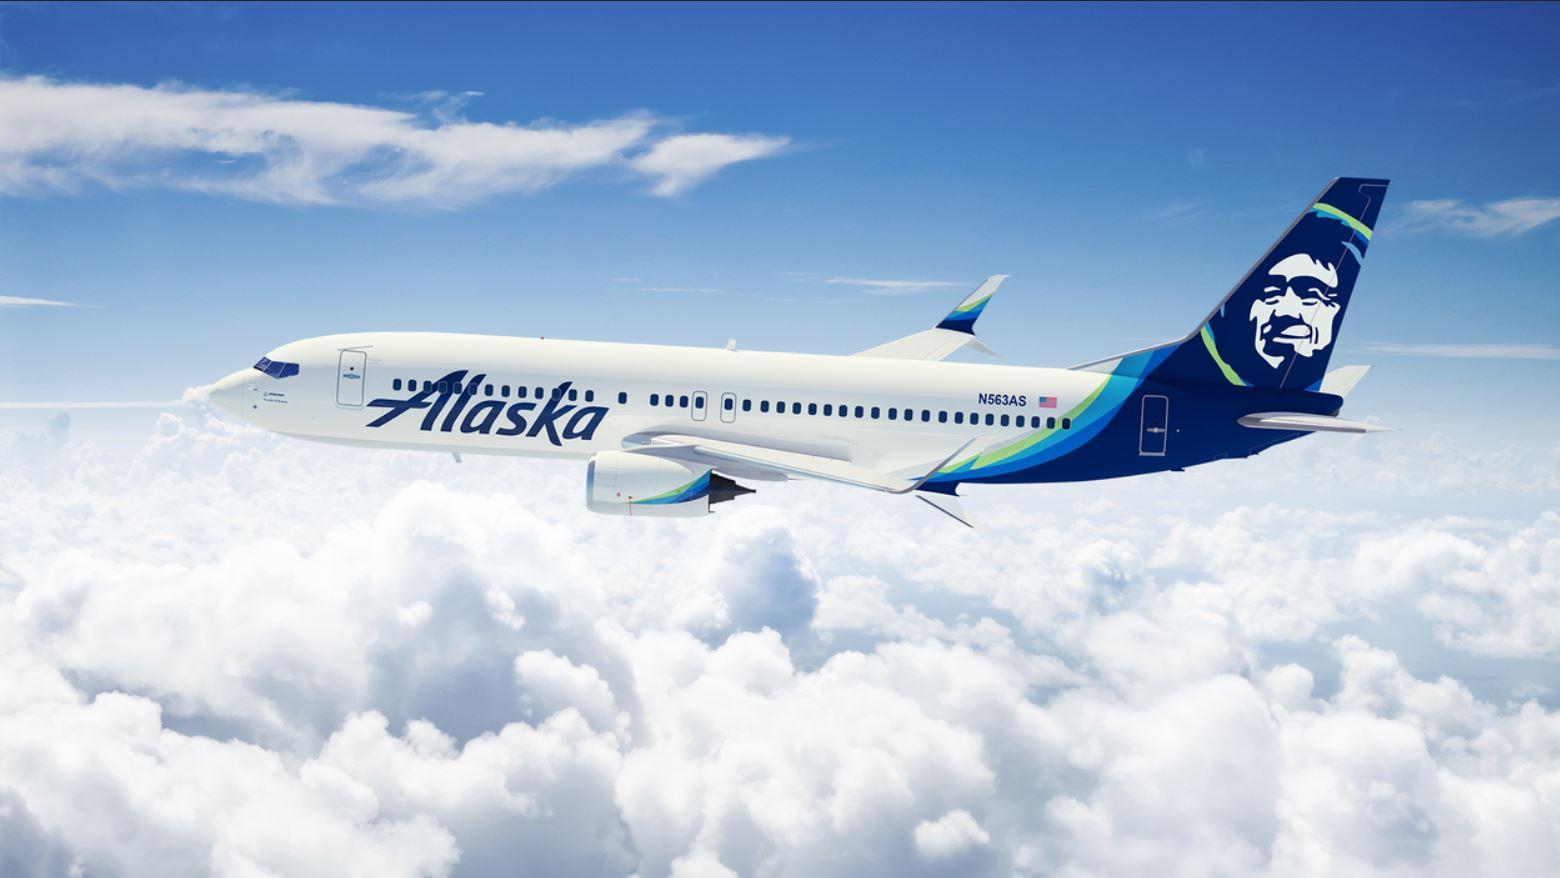 Alaska Air Group Inc At Last Some Hopeful Signs The Motley Fool